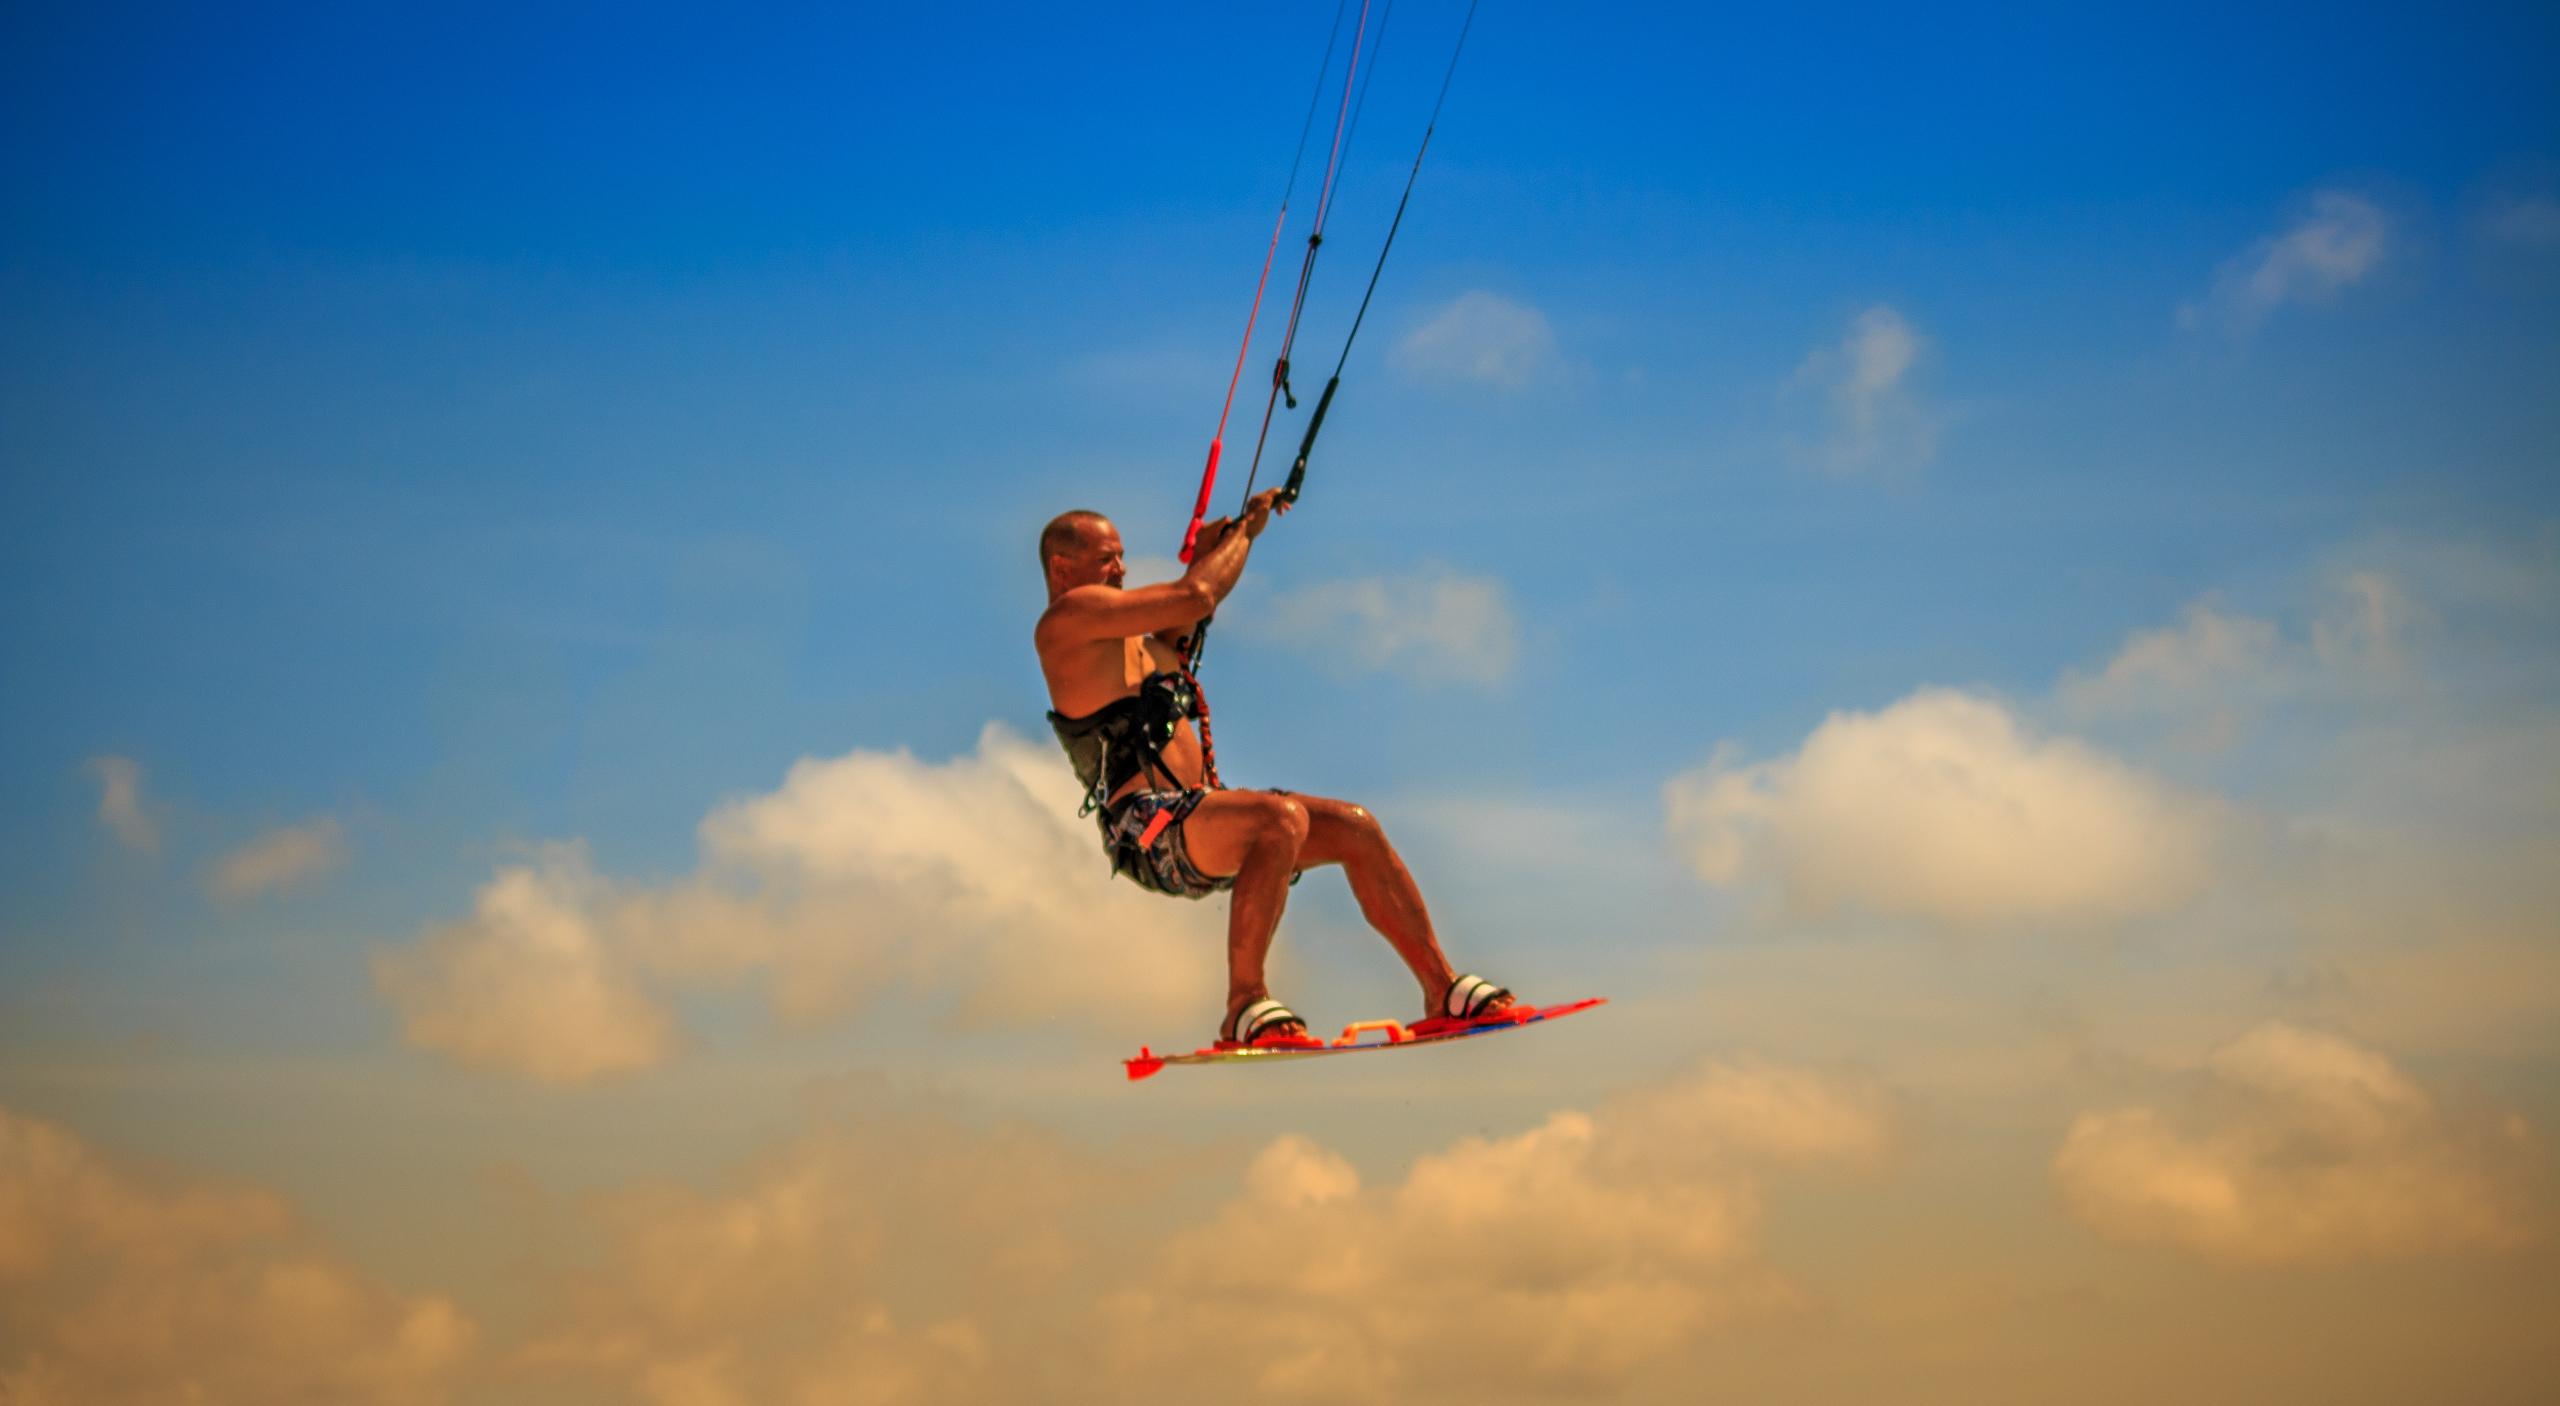 kitesurfing, Aruba, kitlense - melvin1401   ello